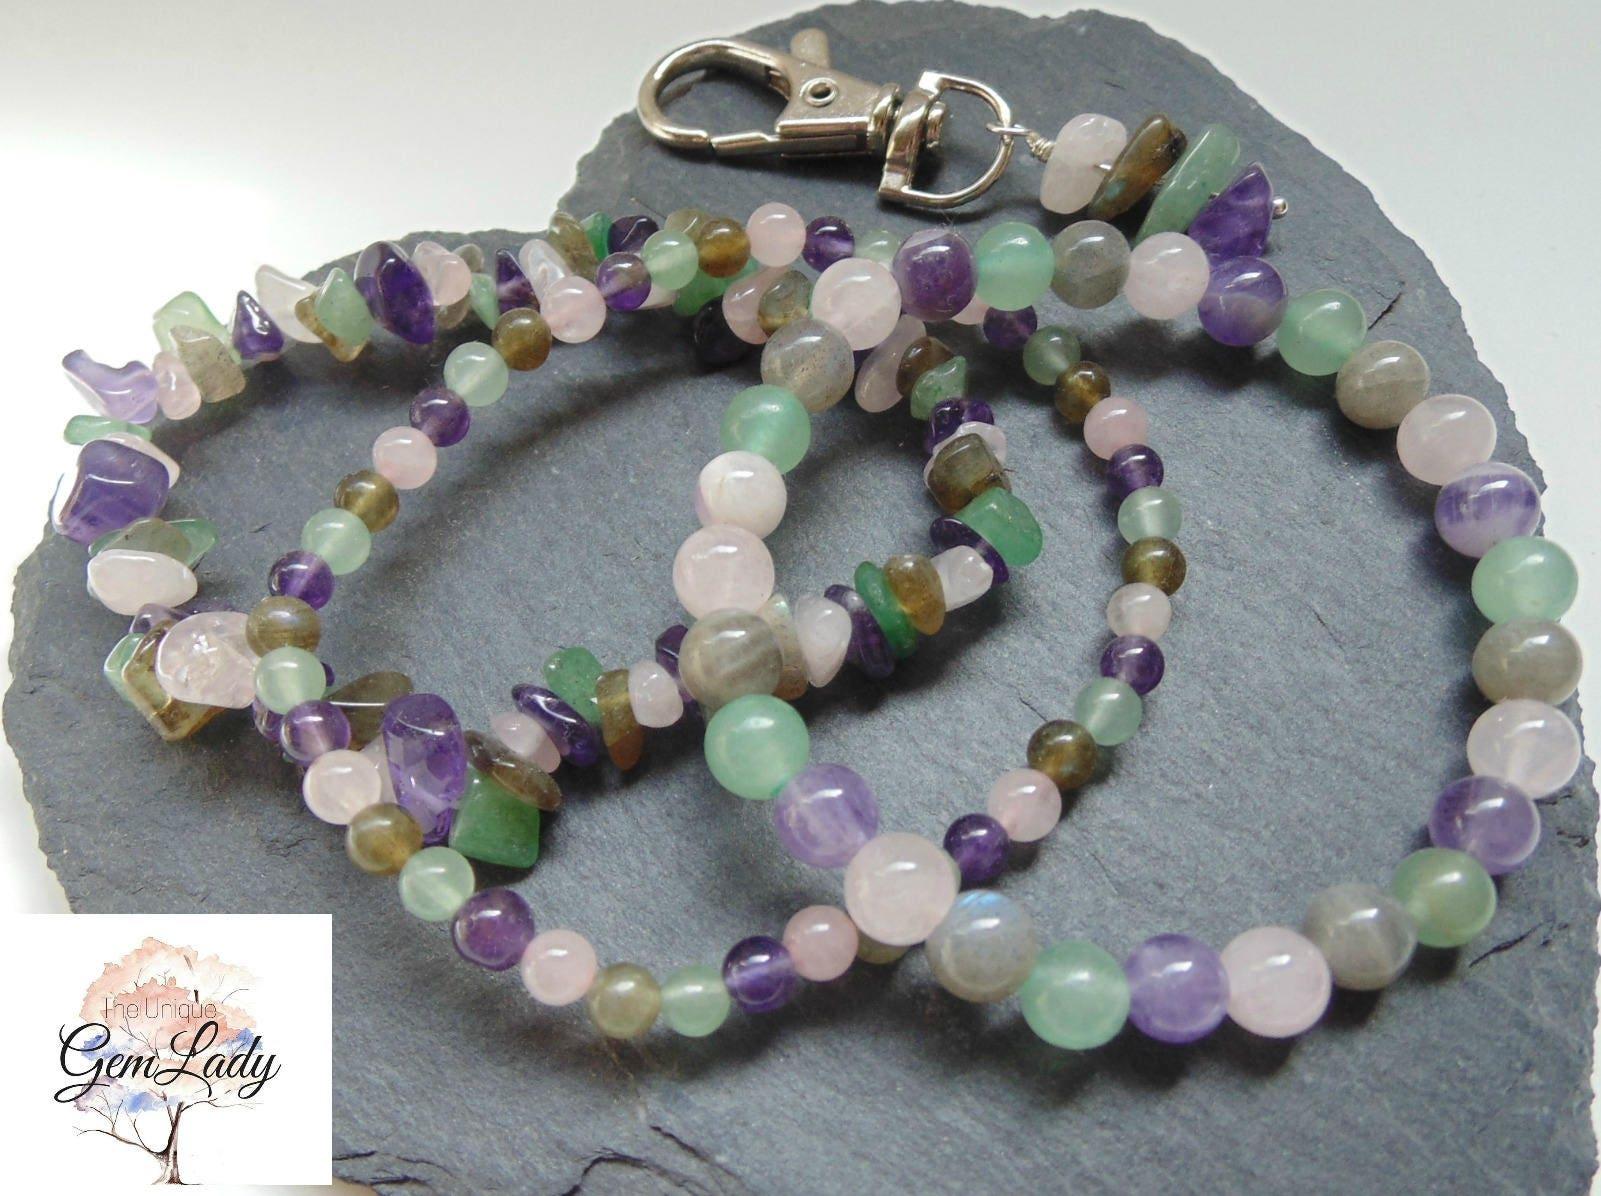 Anxiety  Stress Blend Bead Beaded Stretch Bracelet  Gemstone Crystal Healing  Amethyst Green Aventurine Labradorite Rose Quartz